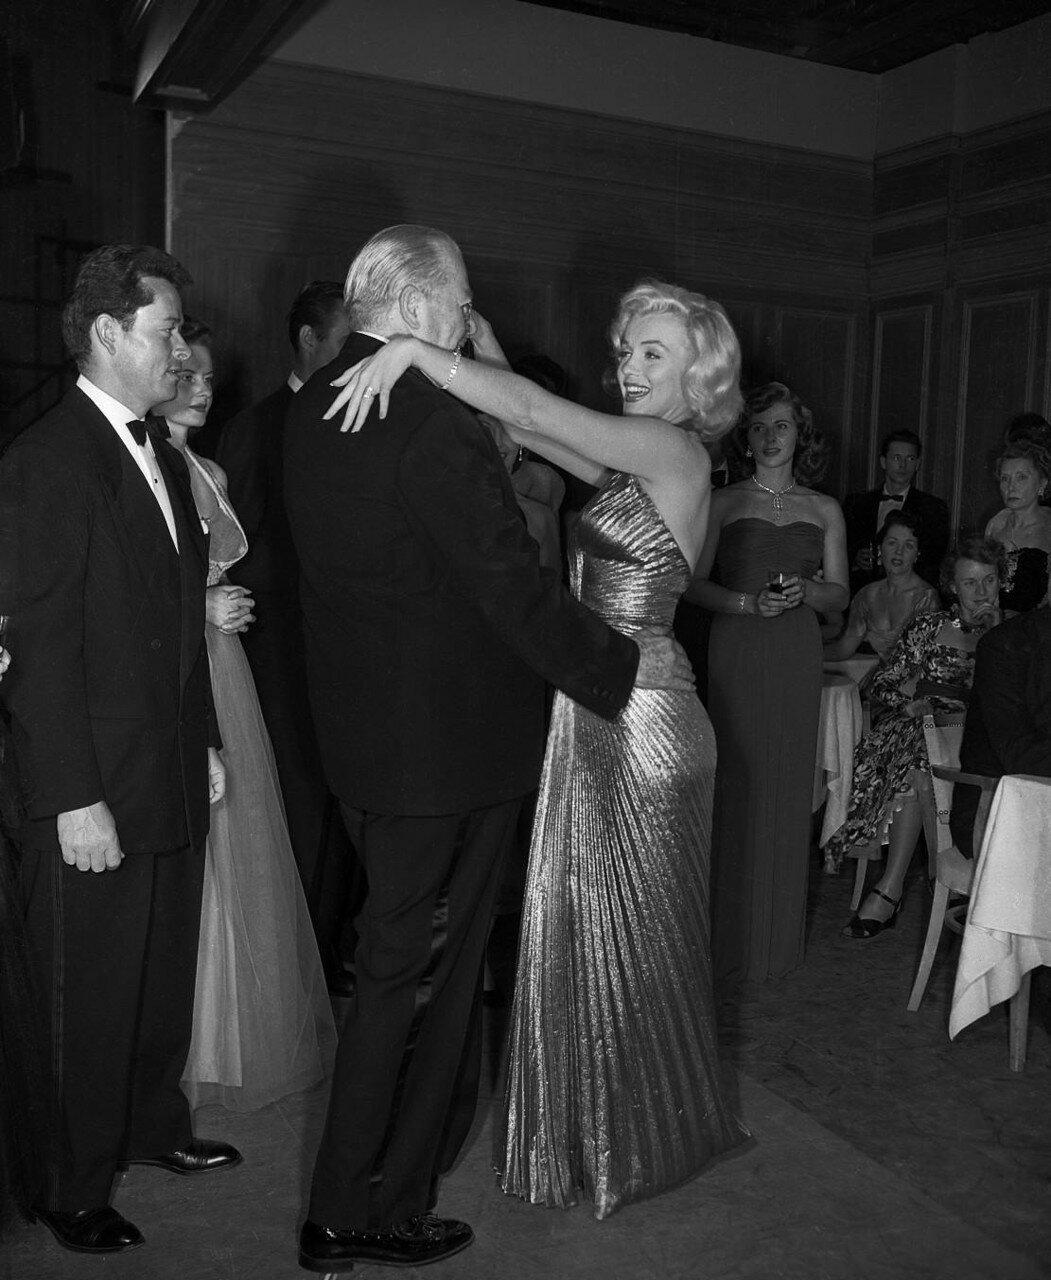 Marilyn Monroe and Charles Coburn Dancing